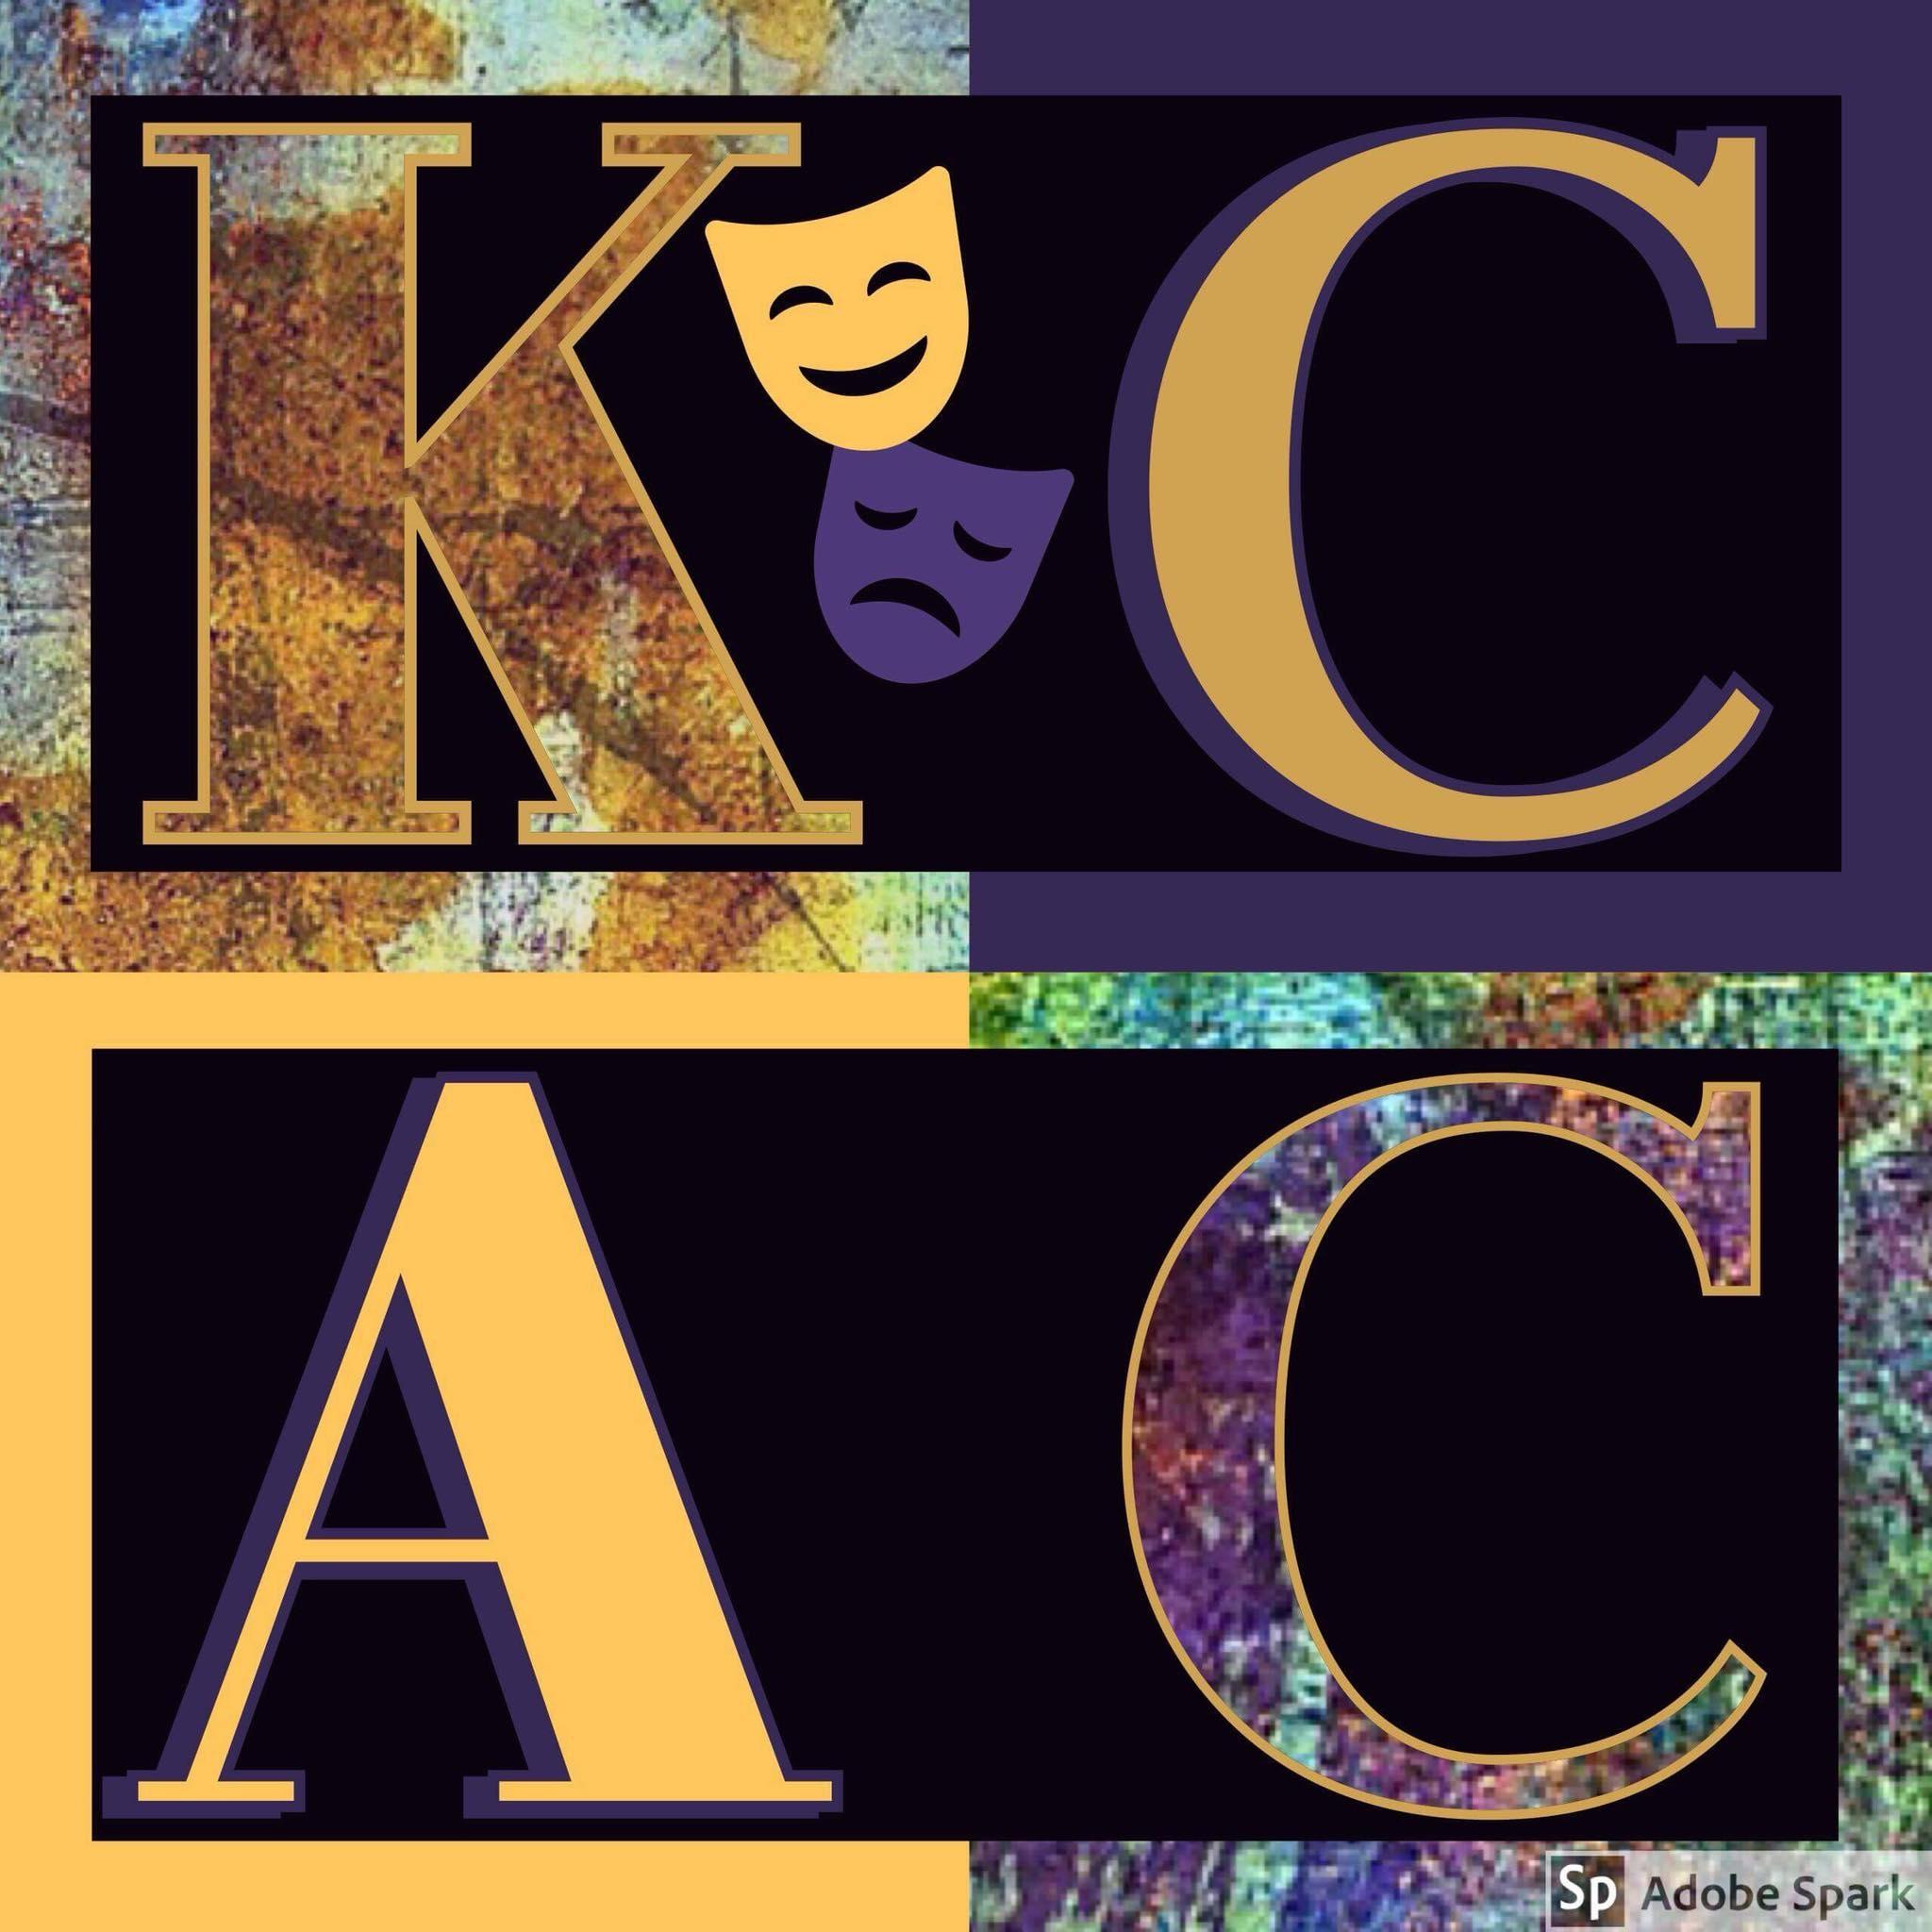 KCAC_logo.jpeg